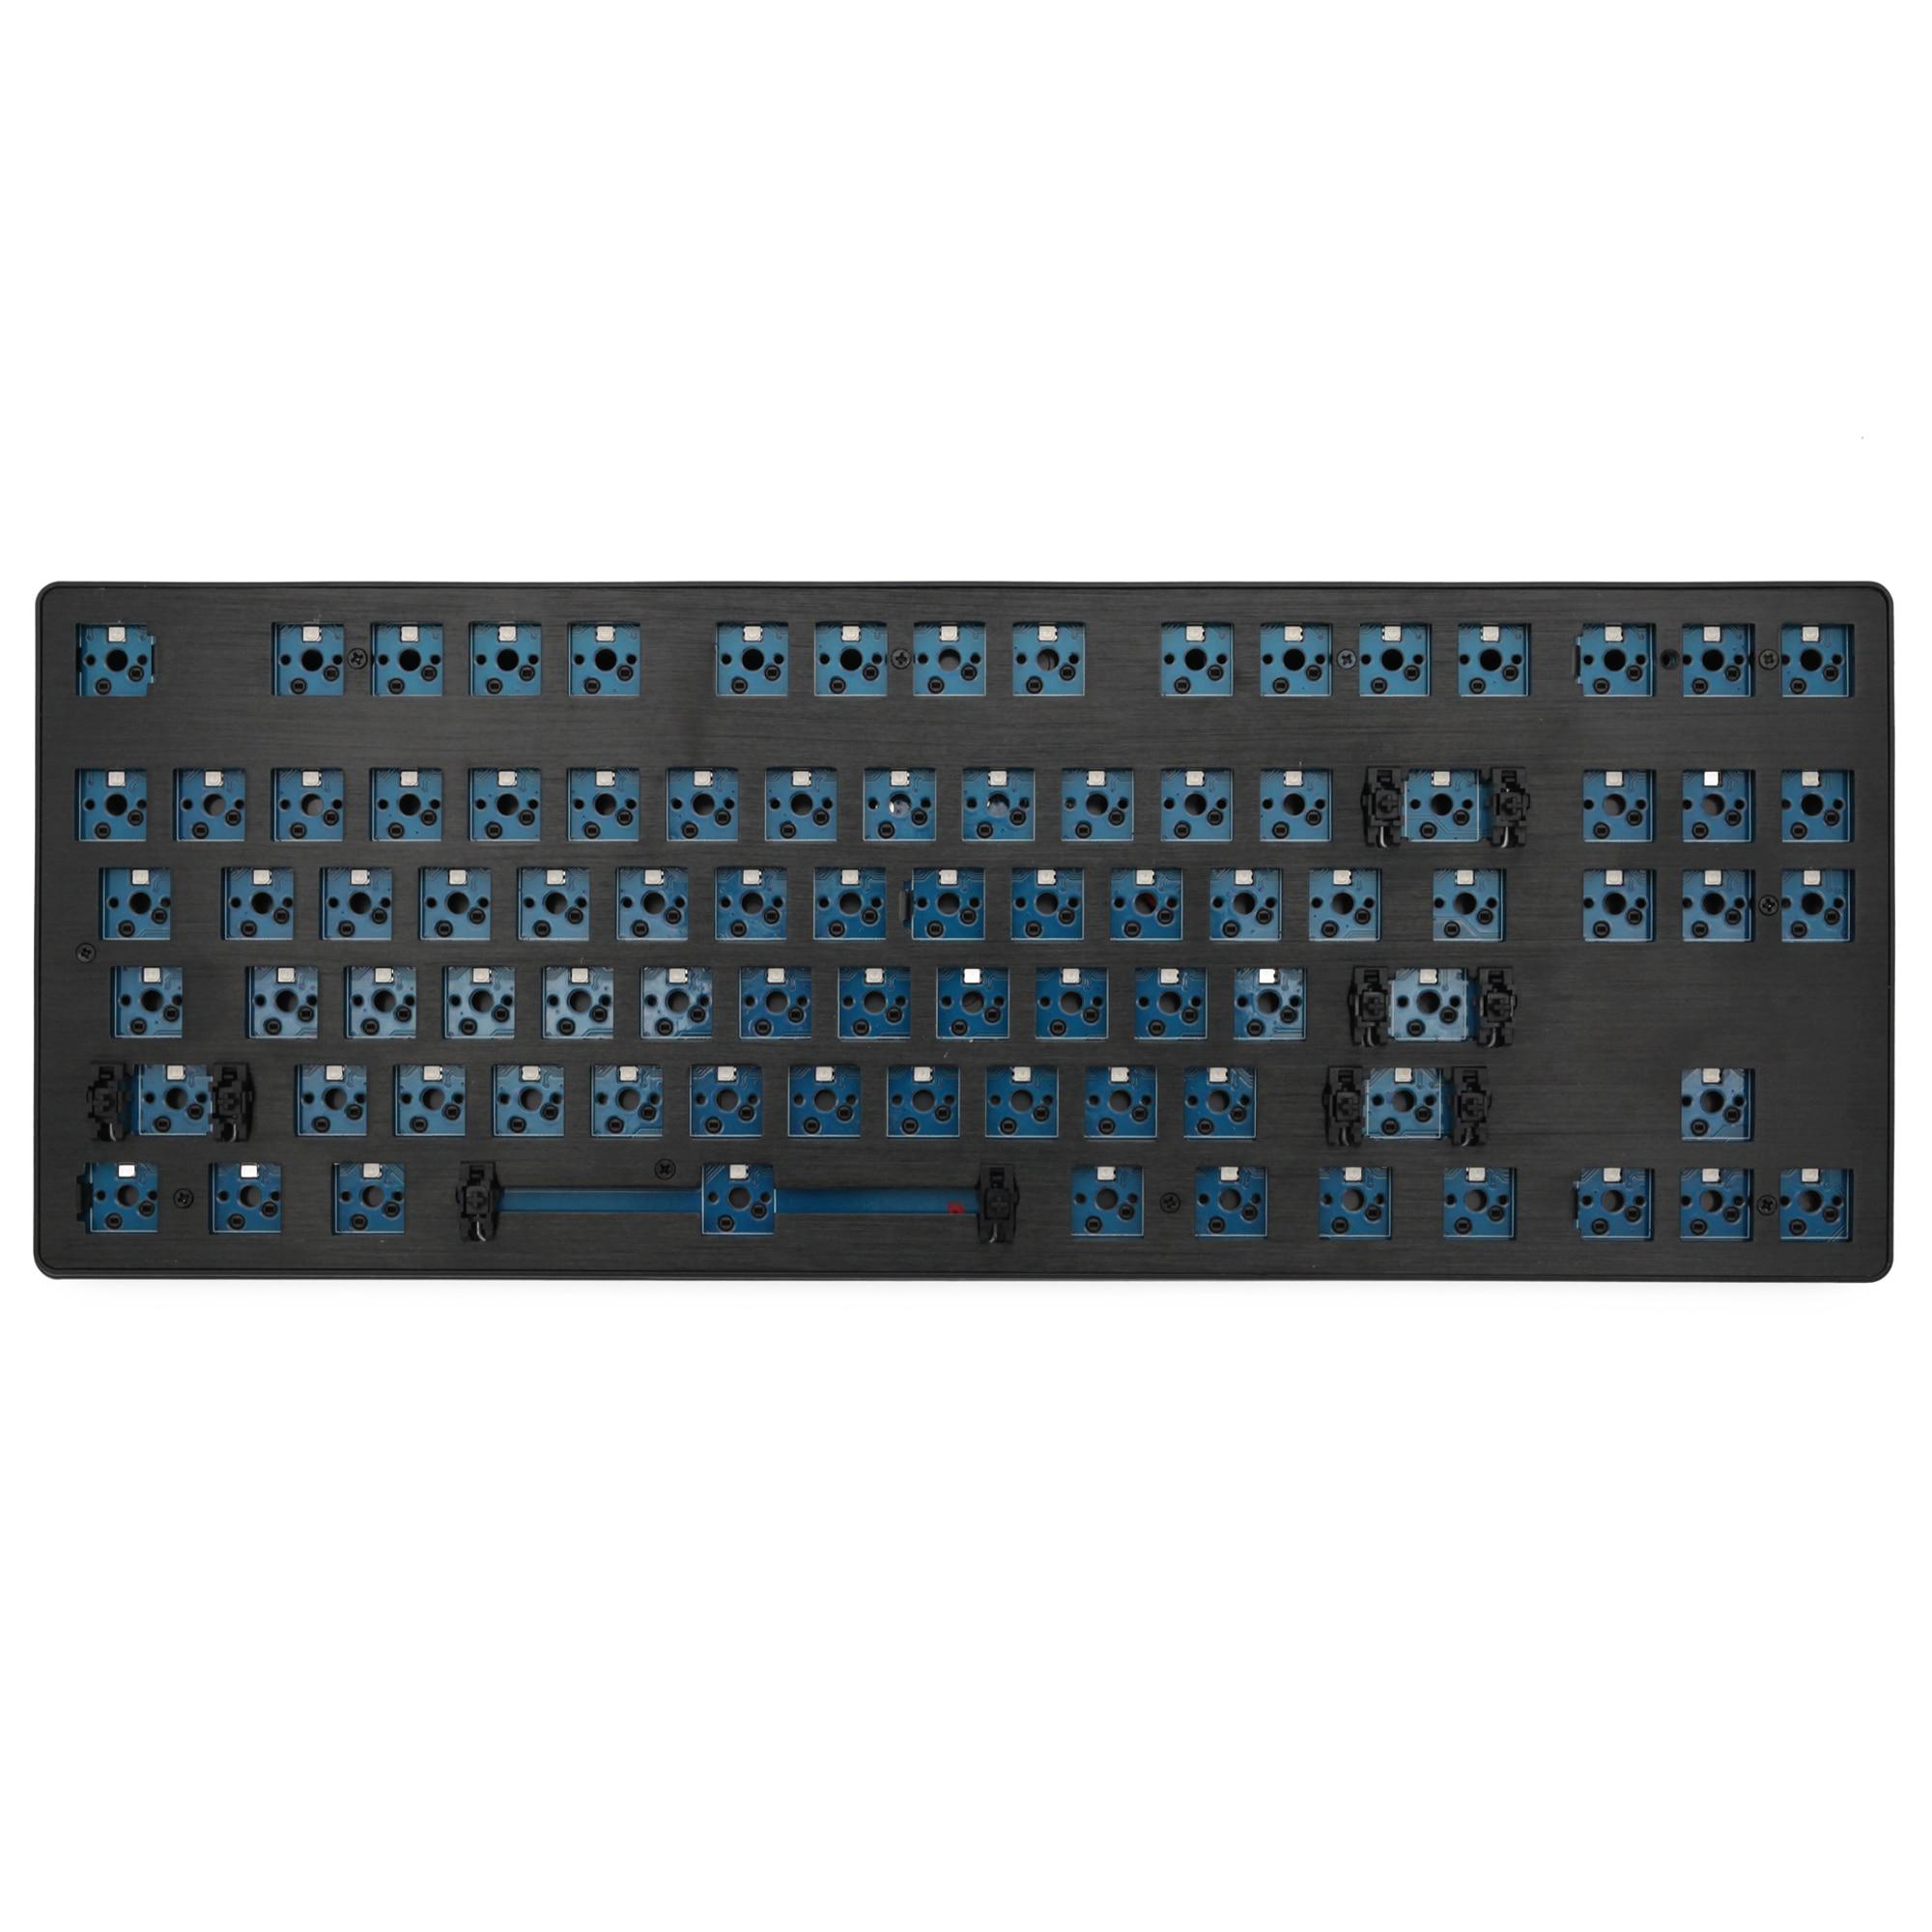 Smart Duck xs87 87-لوحة مفاتيح ميكانيكية ذات 87 مفتاحًا ، مجموعة 80% TKL ، مفتاح قابل للتبديل السريع ، تأثير الإضاءة ، مفتاح RGB ، led ، نوع c ، برنامج ماكرو